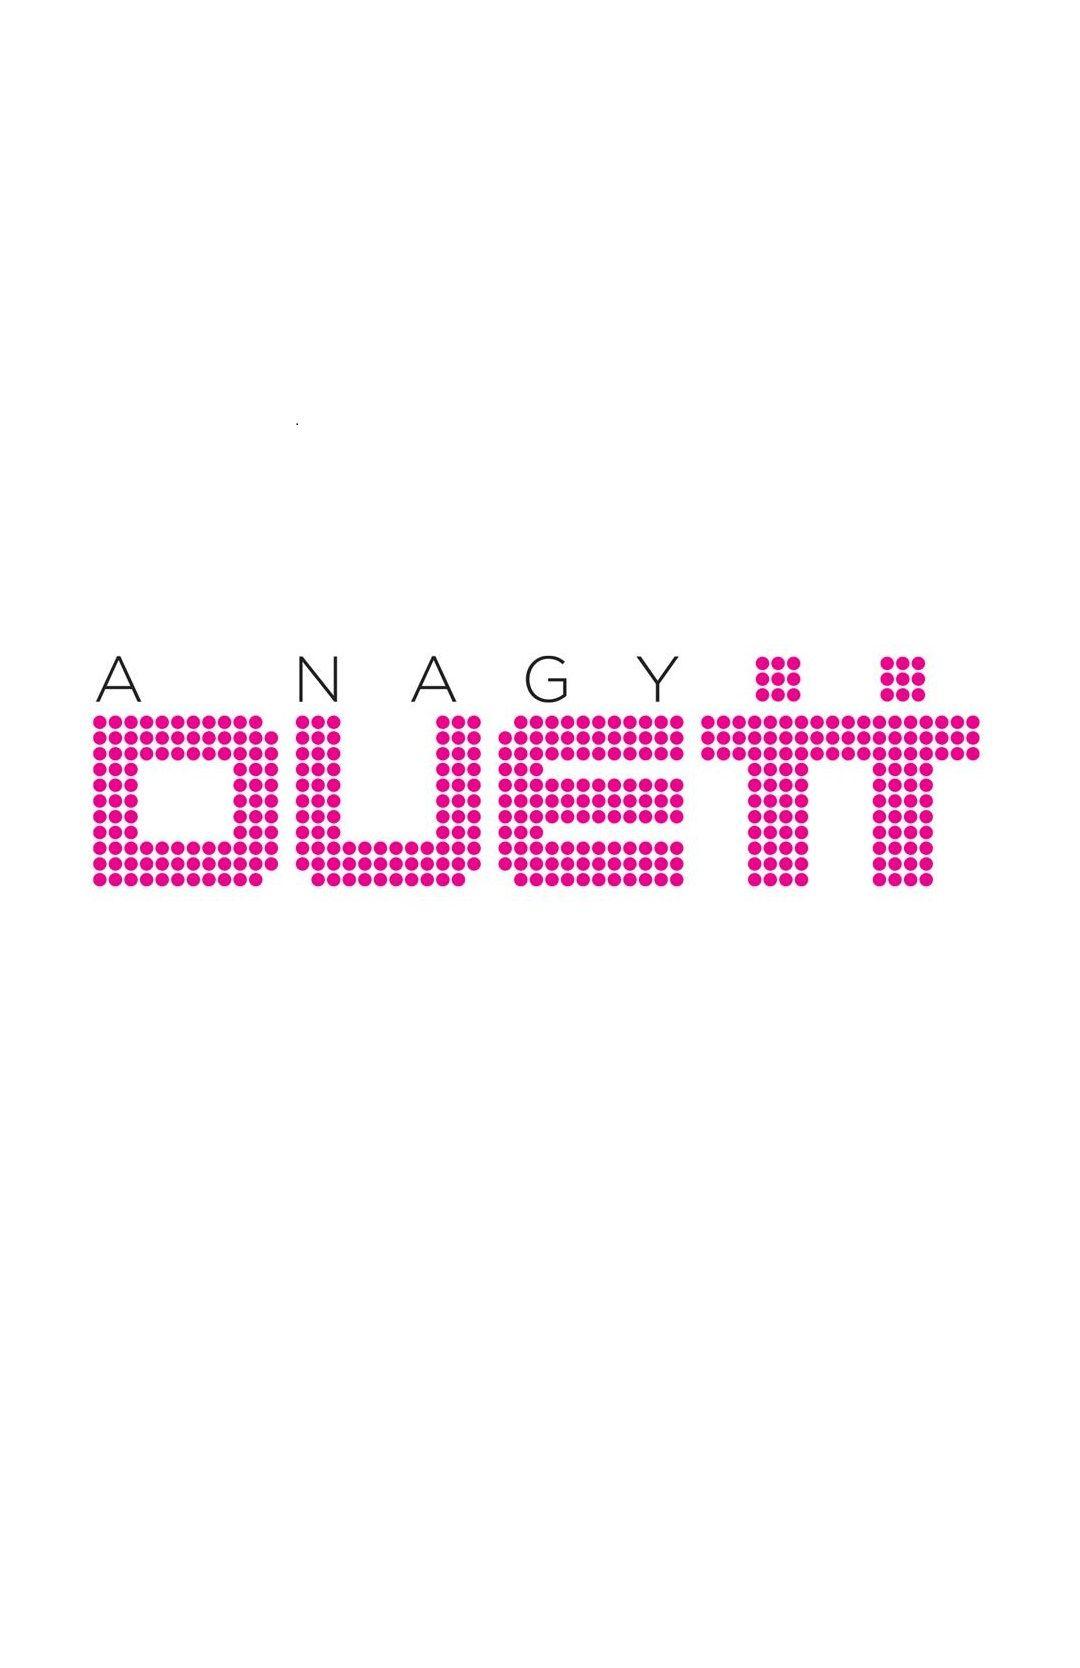 A nagy duett cover